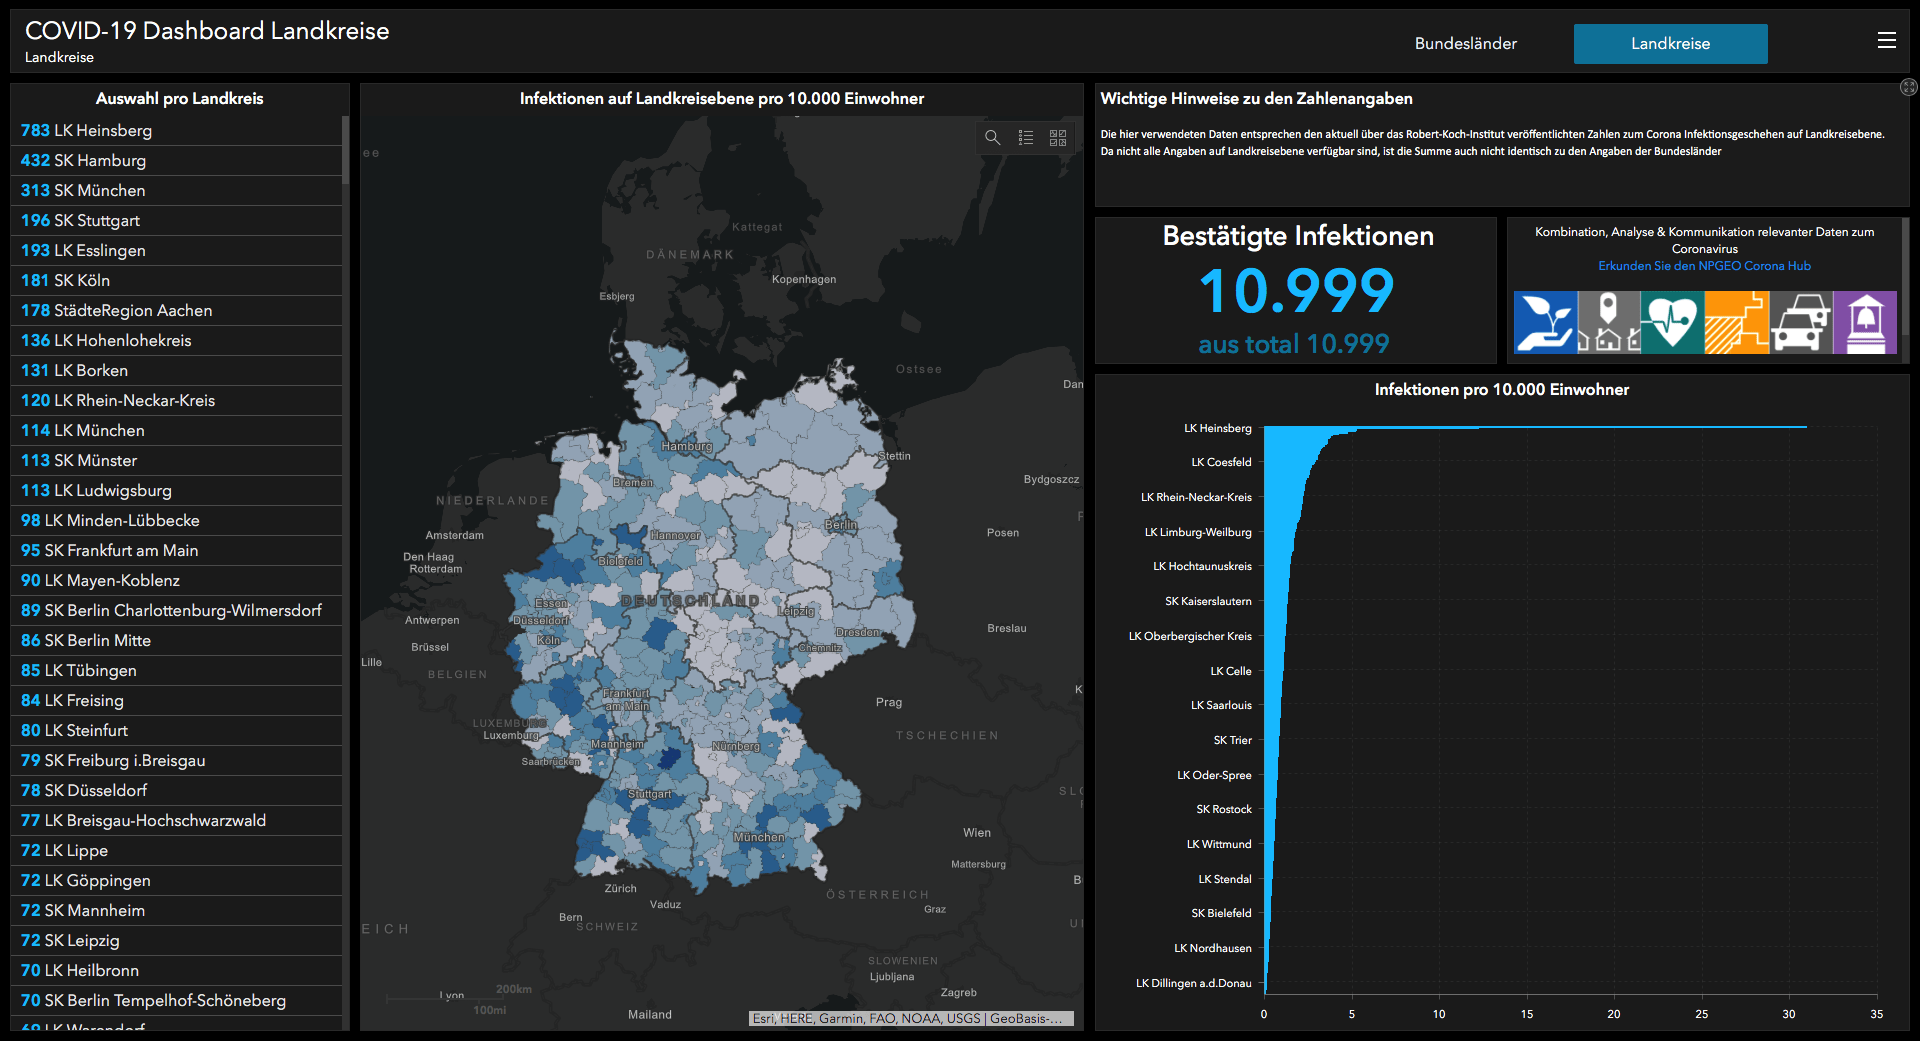 Coronavirus in Deutschland Interaktive Karte